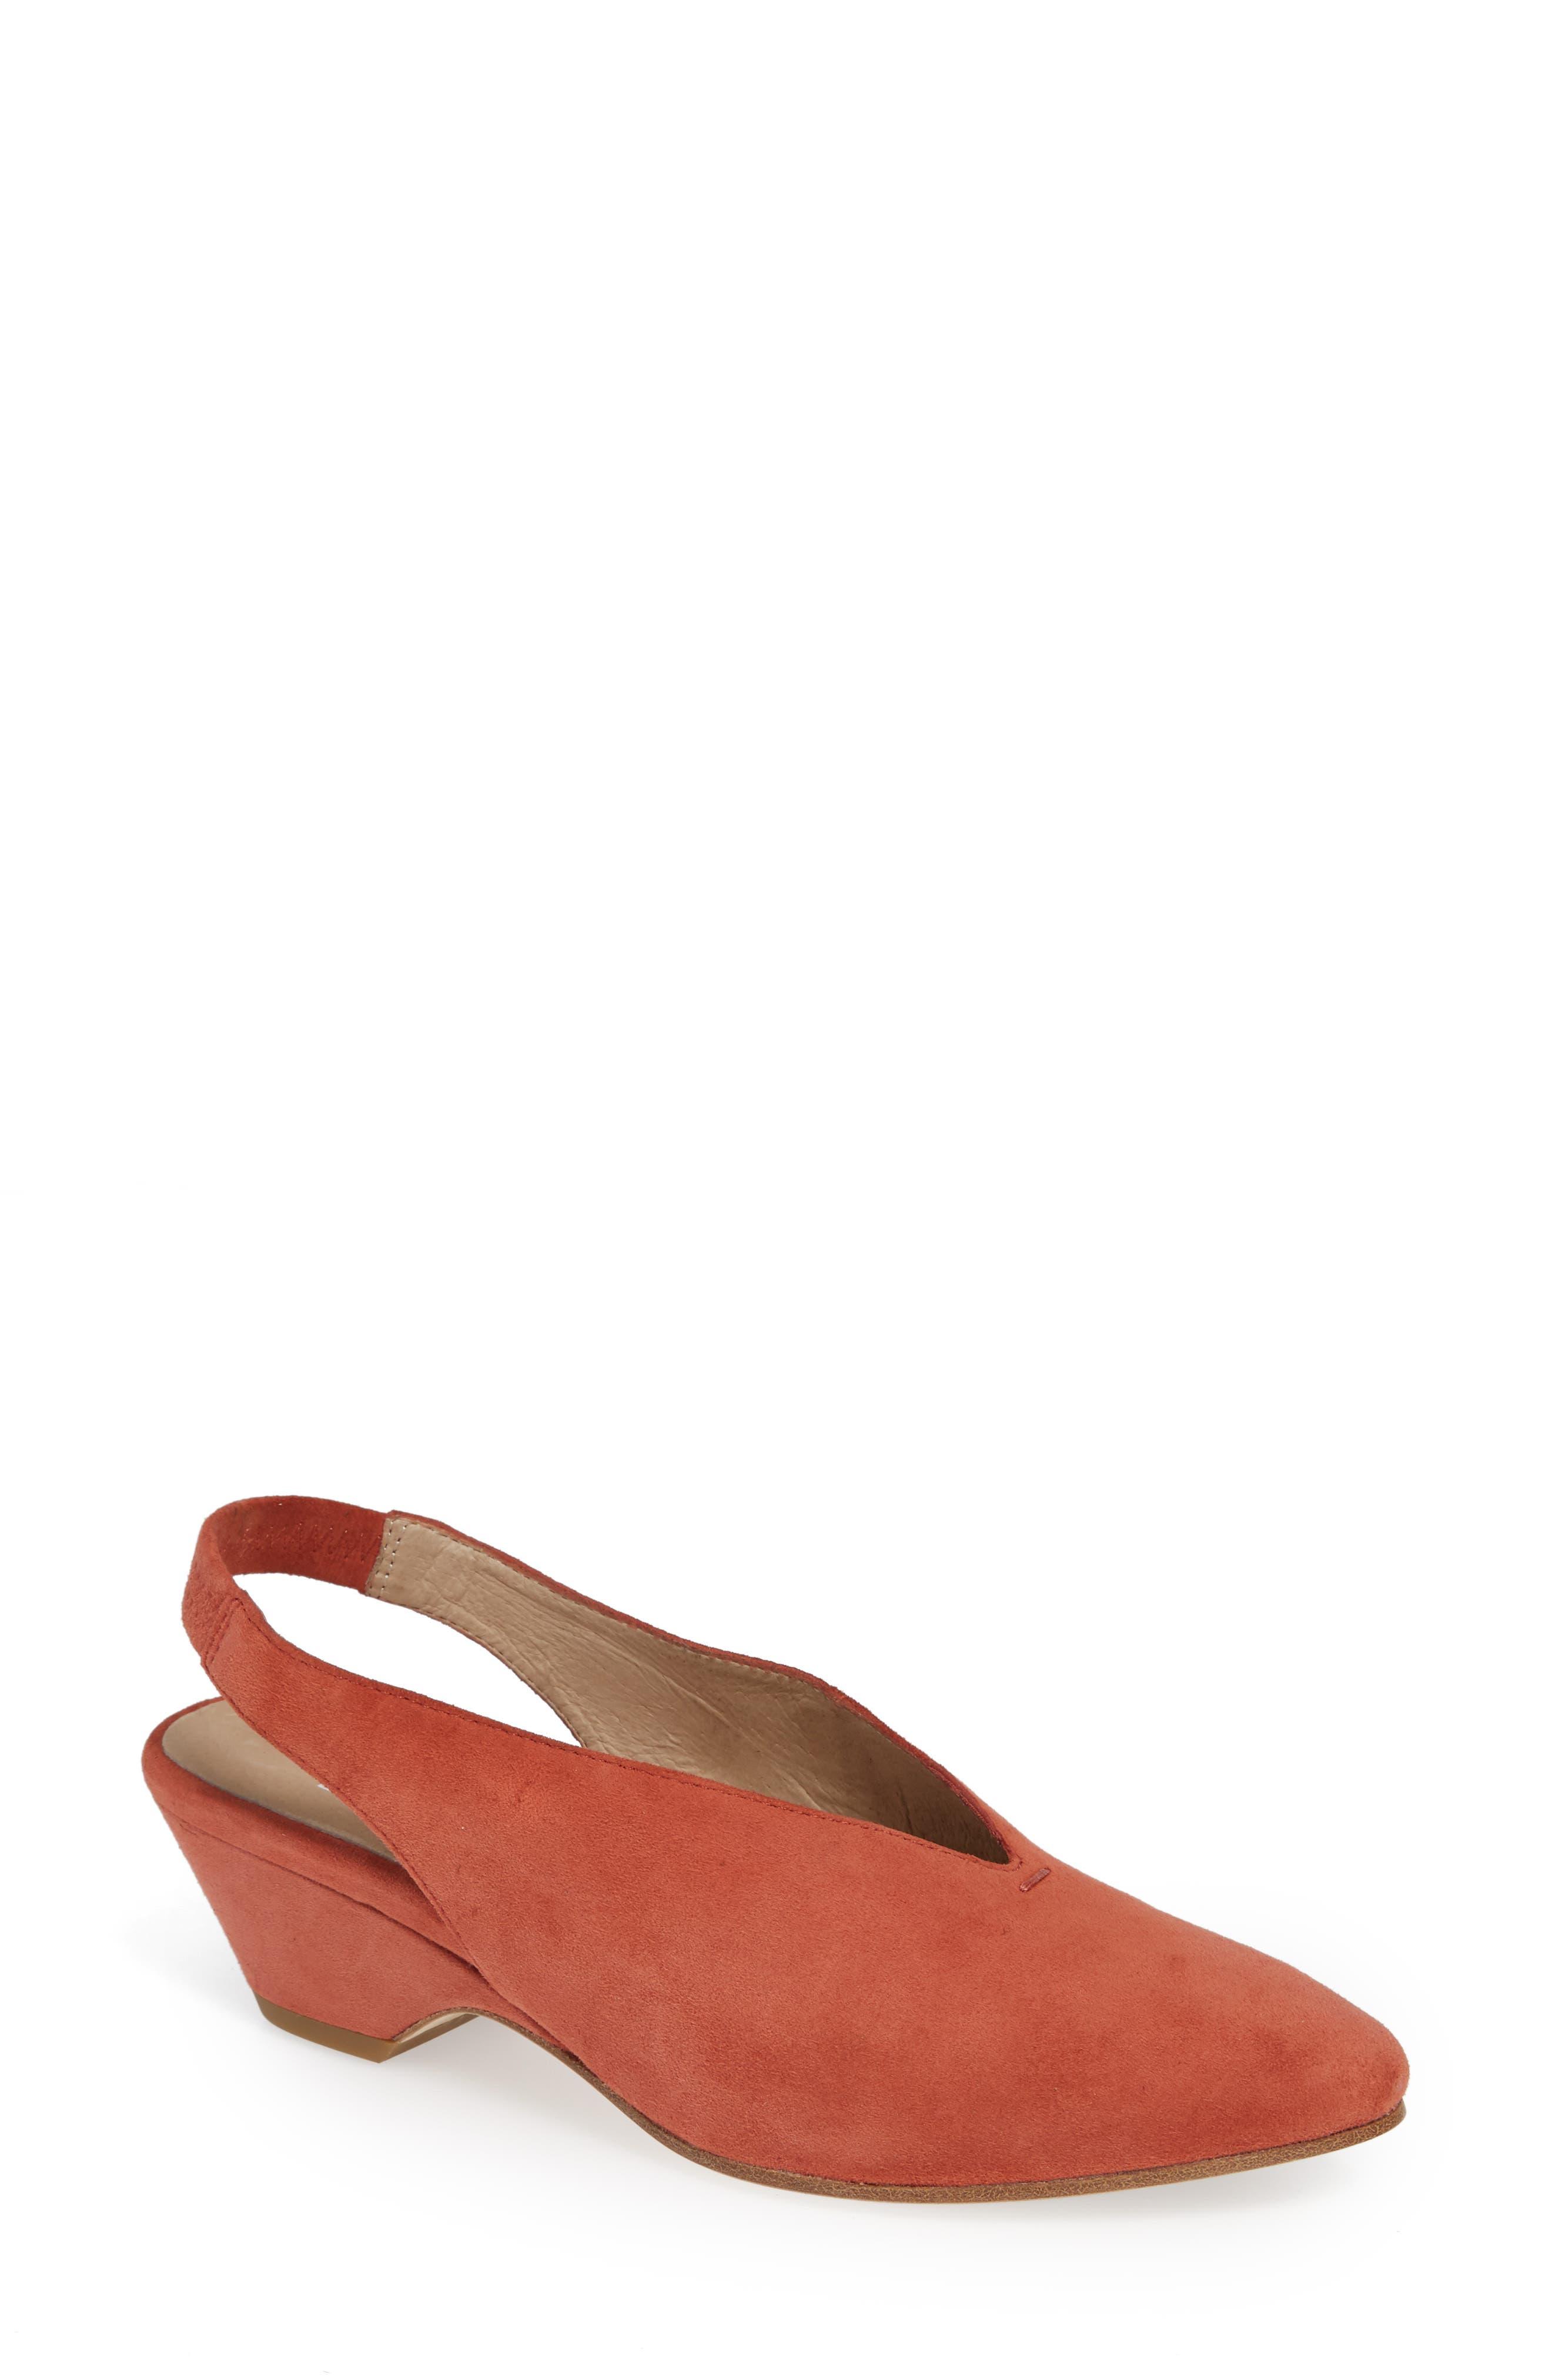 Eileen Fisher Gatwick Slingback Pump- Red